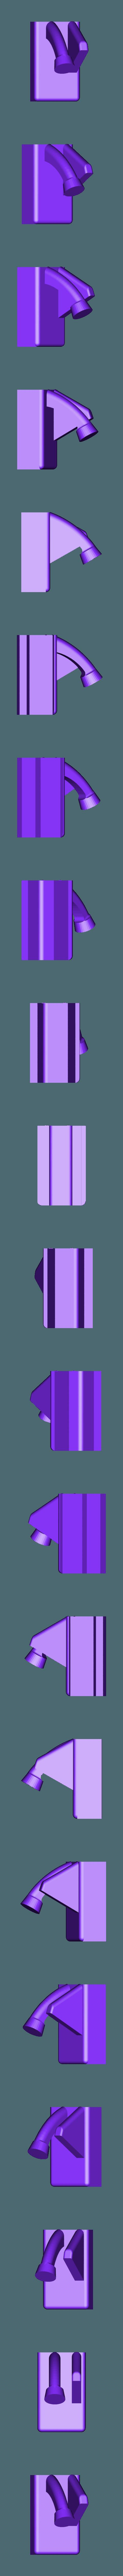 13pedals.stl Download STL file Ratrod Pickup • 3D printing template, macone1